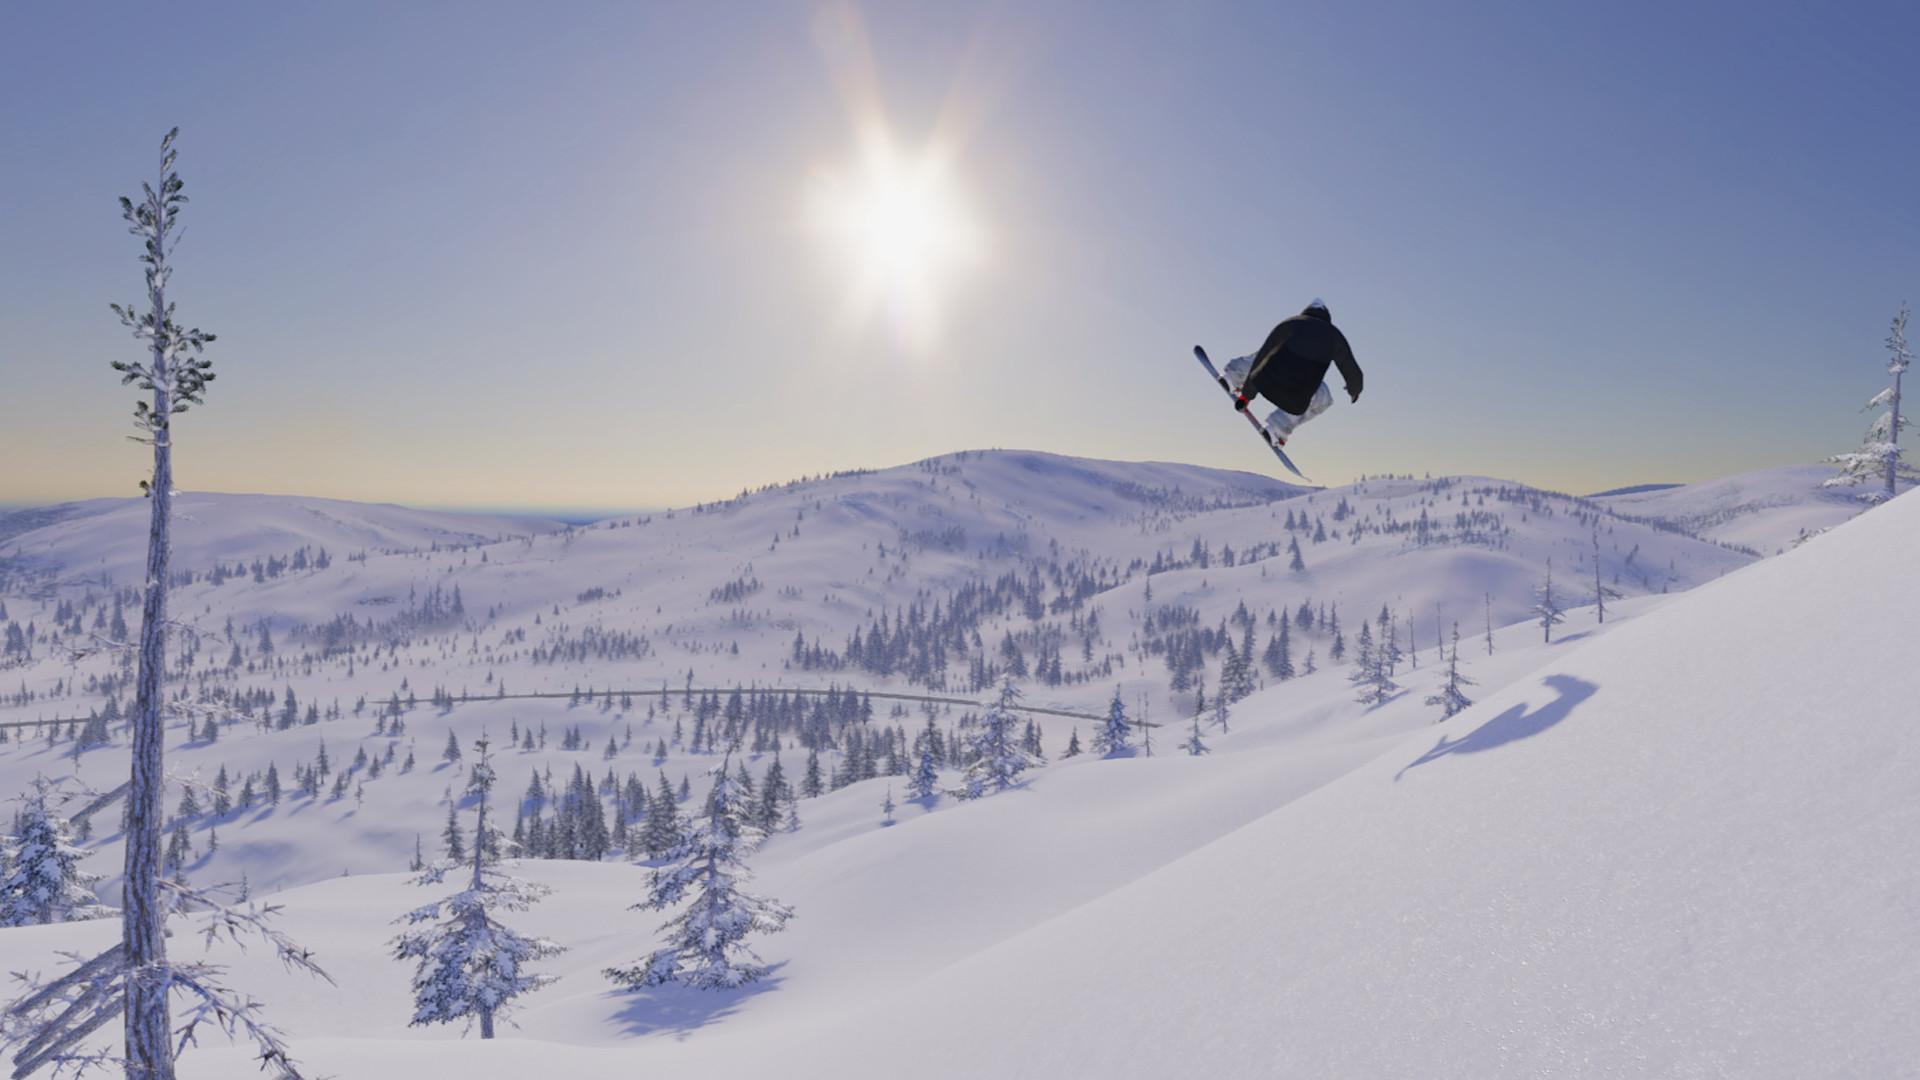 Snowboarding dating website